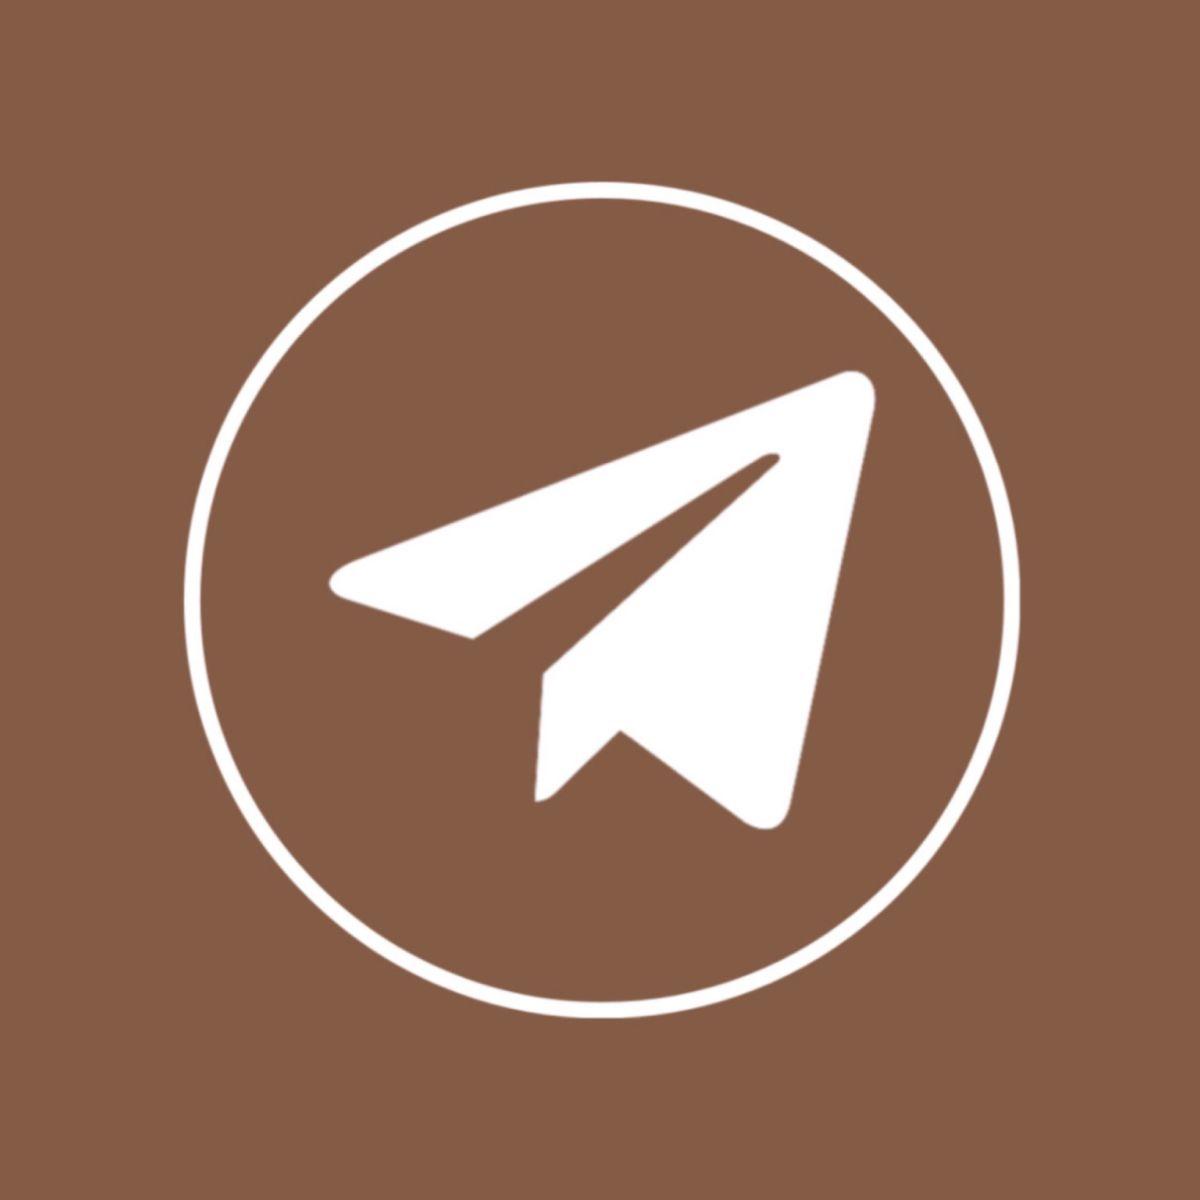 Telegram App Icon Brown Aesthetic Di 2021 Ikon Ikon Aplikasi Aplikasi Iphone